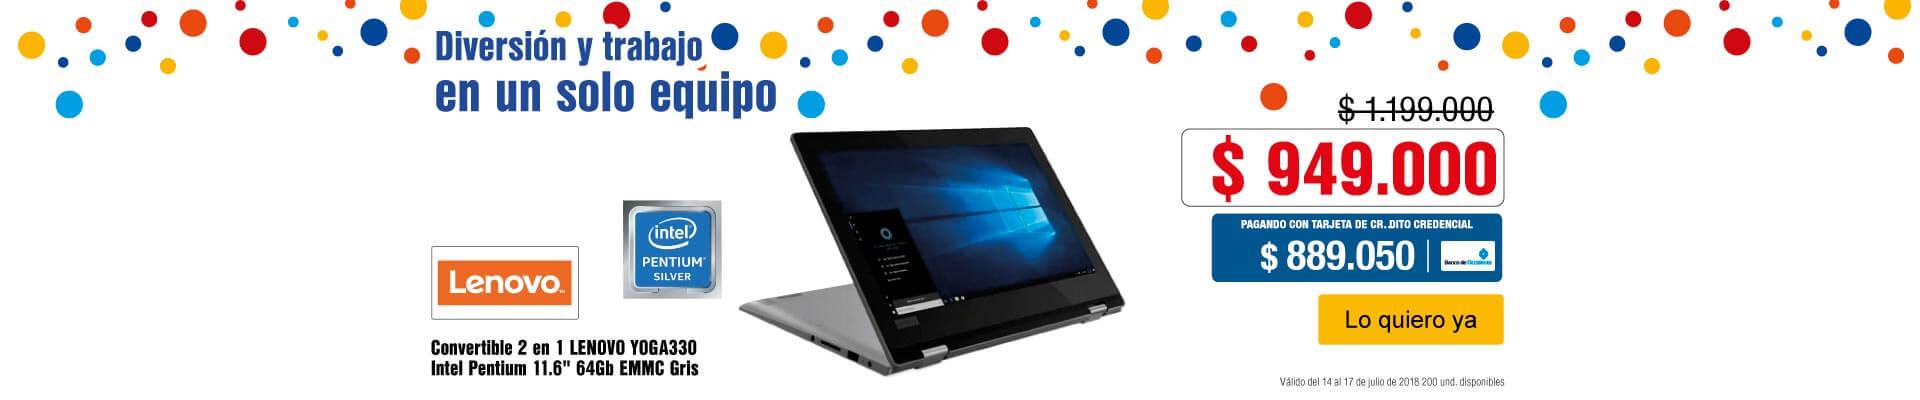 AK-PPAL-3-computadores y tablets-PP---Lenovo-2n1YOGA330-Jul16